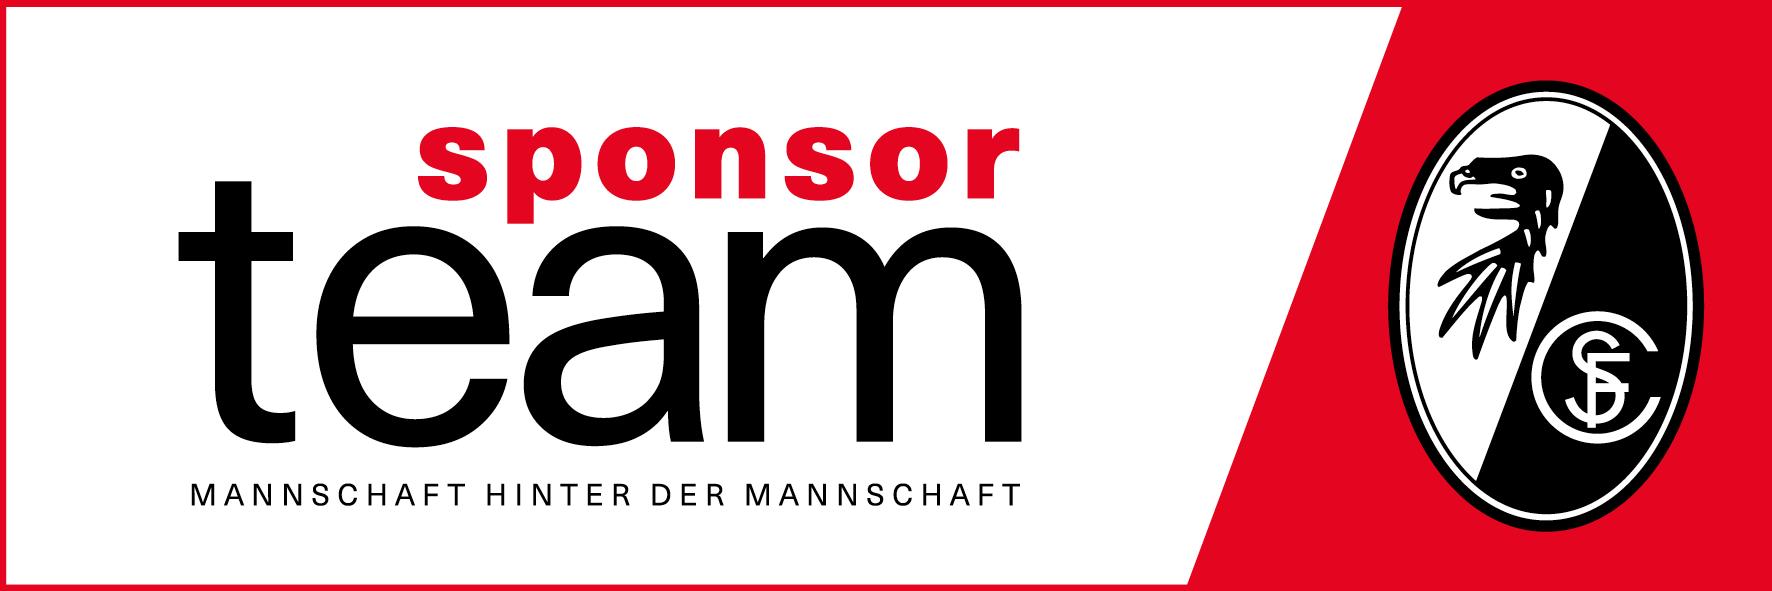 Compositelogo_Sponsorteam_SCFreiburg